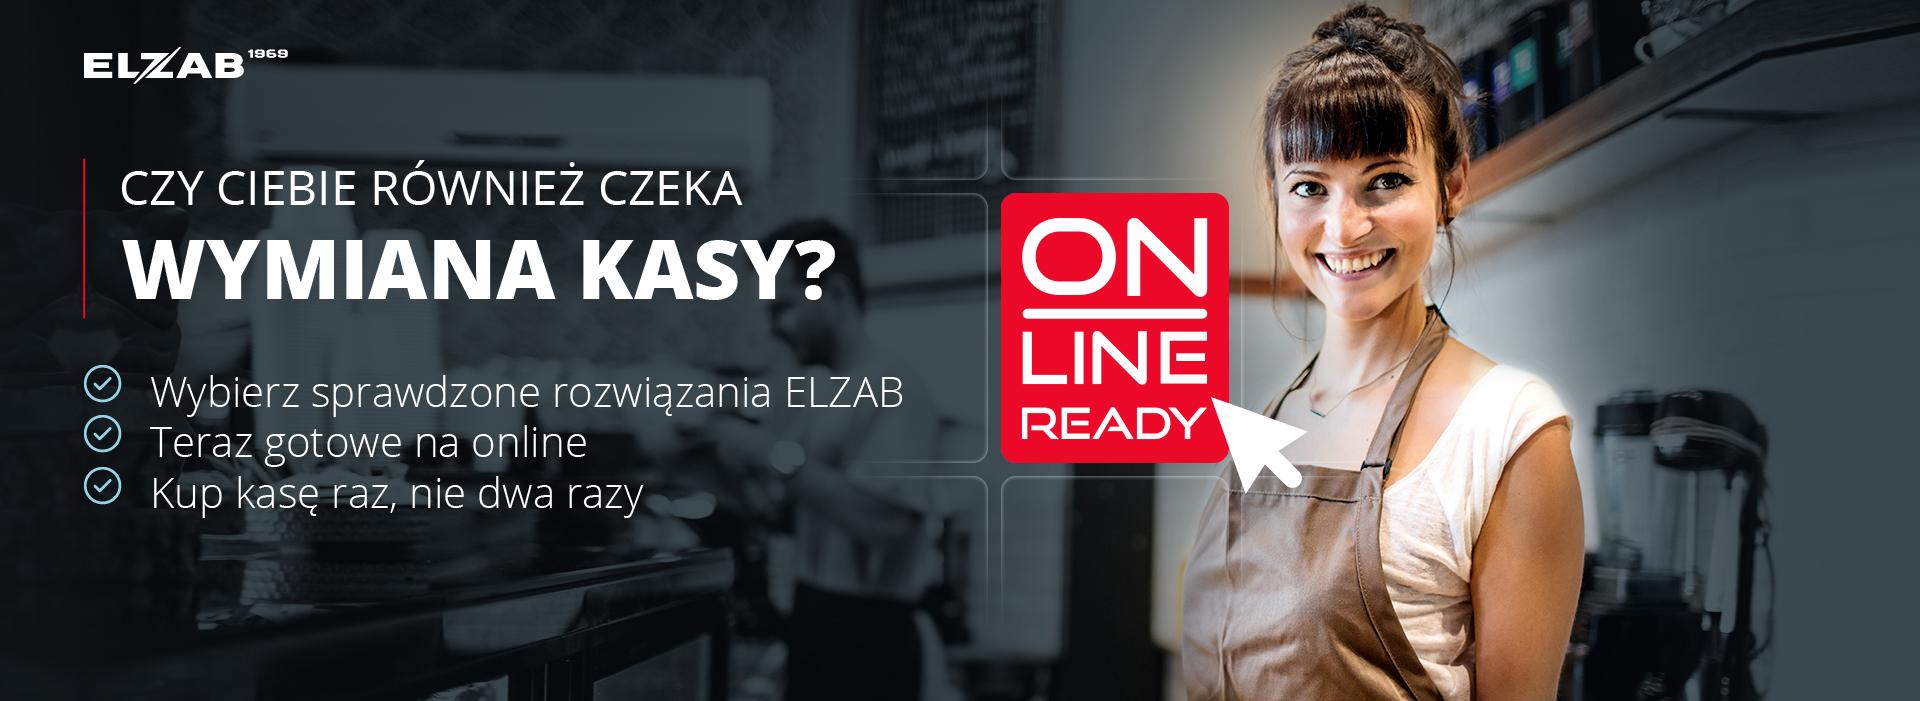 ElzabOnlinReady.jpg